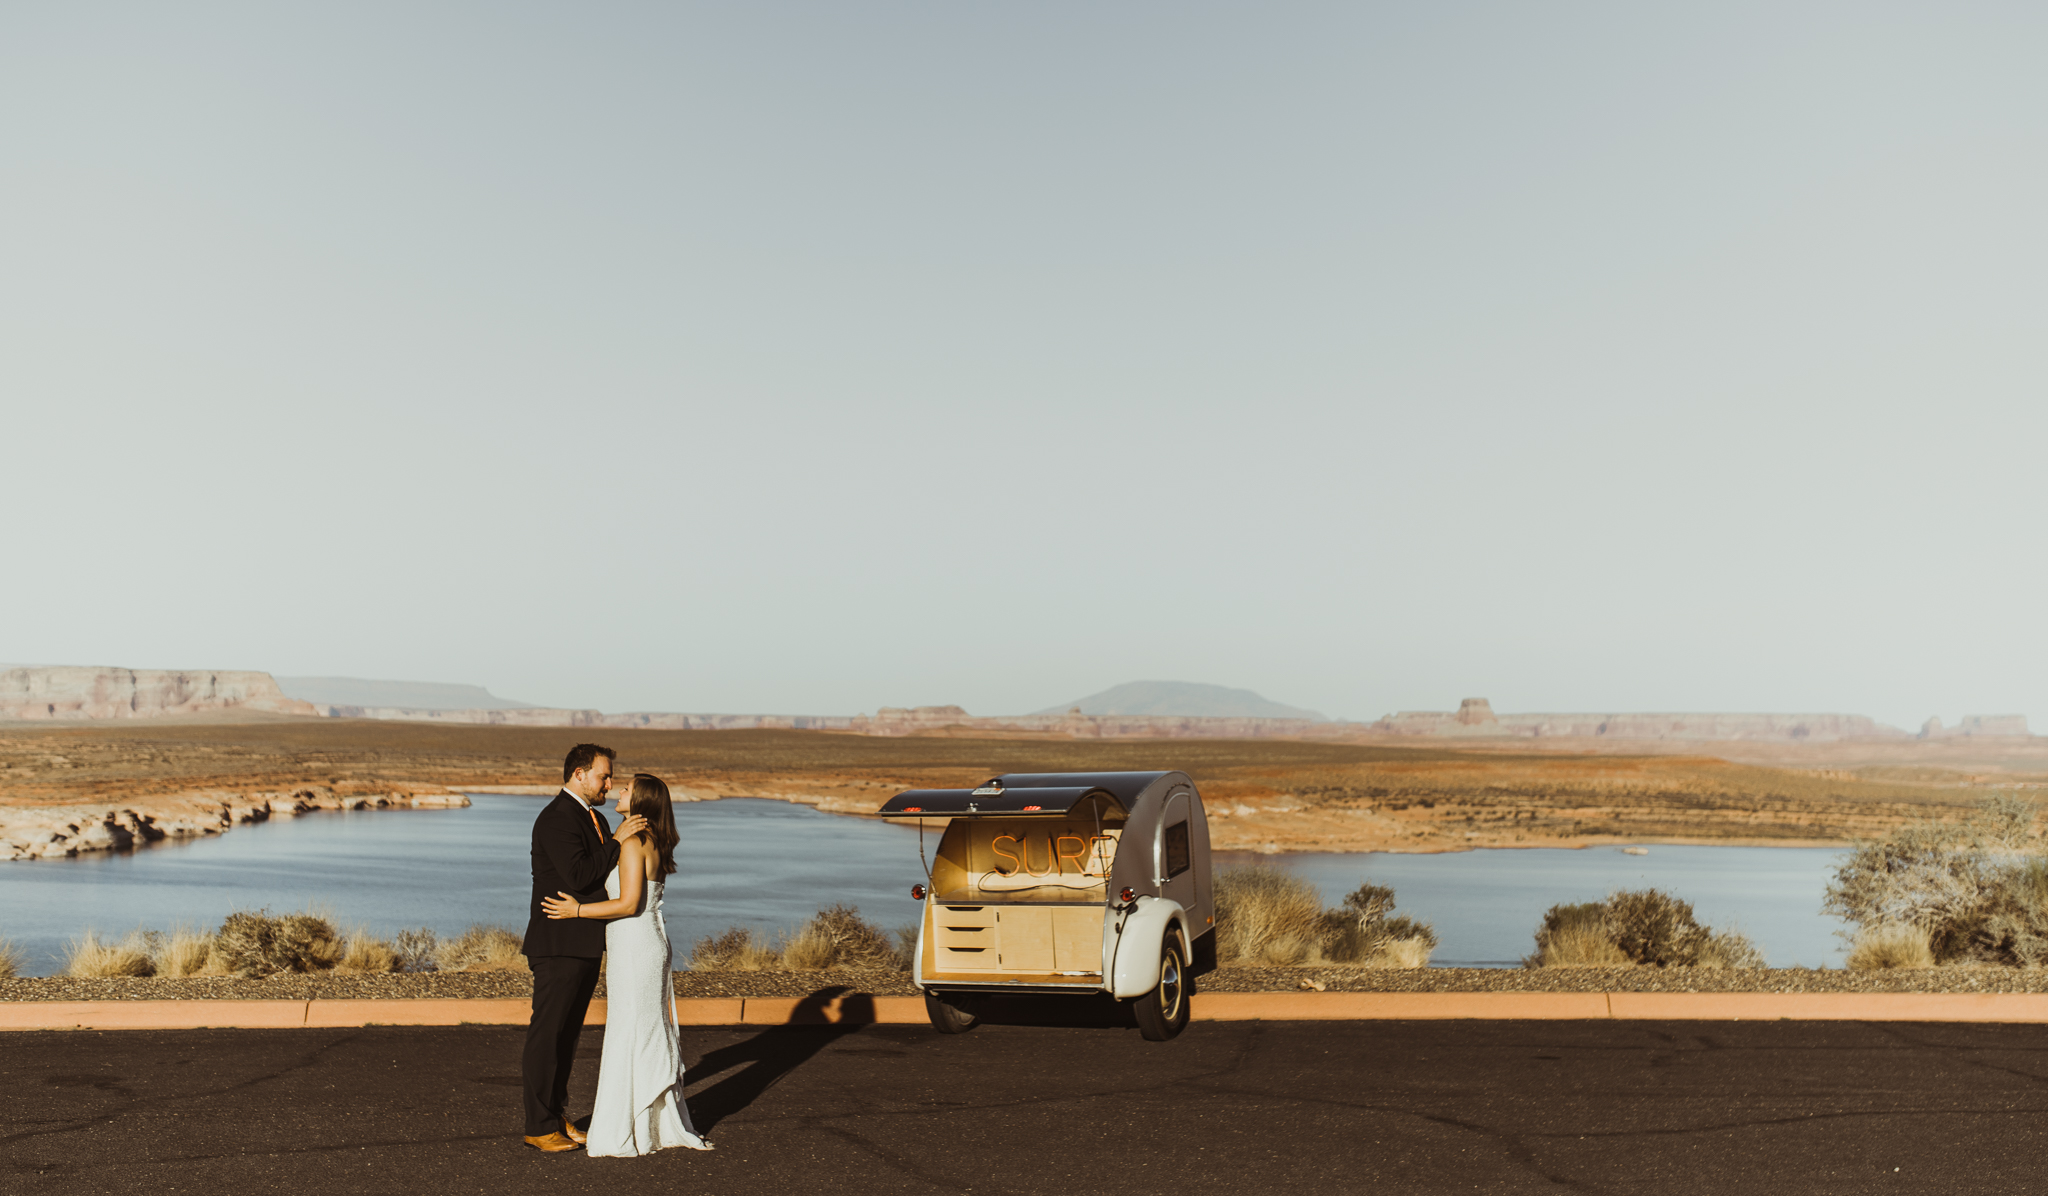 ©Isaiah + Taylor Photography - Lake Powell Elopement & Antelope Canyon & Horseshoe Bend, Page, Arizona-51.jpg